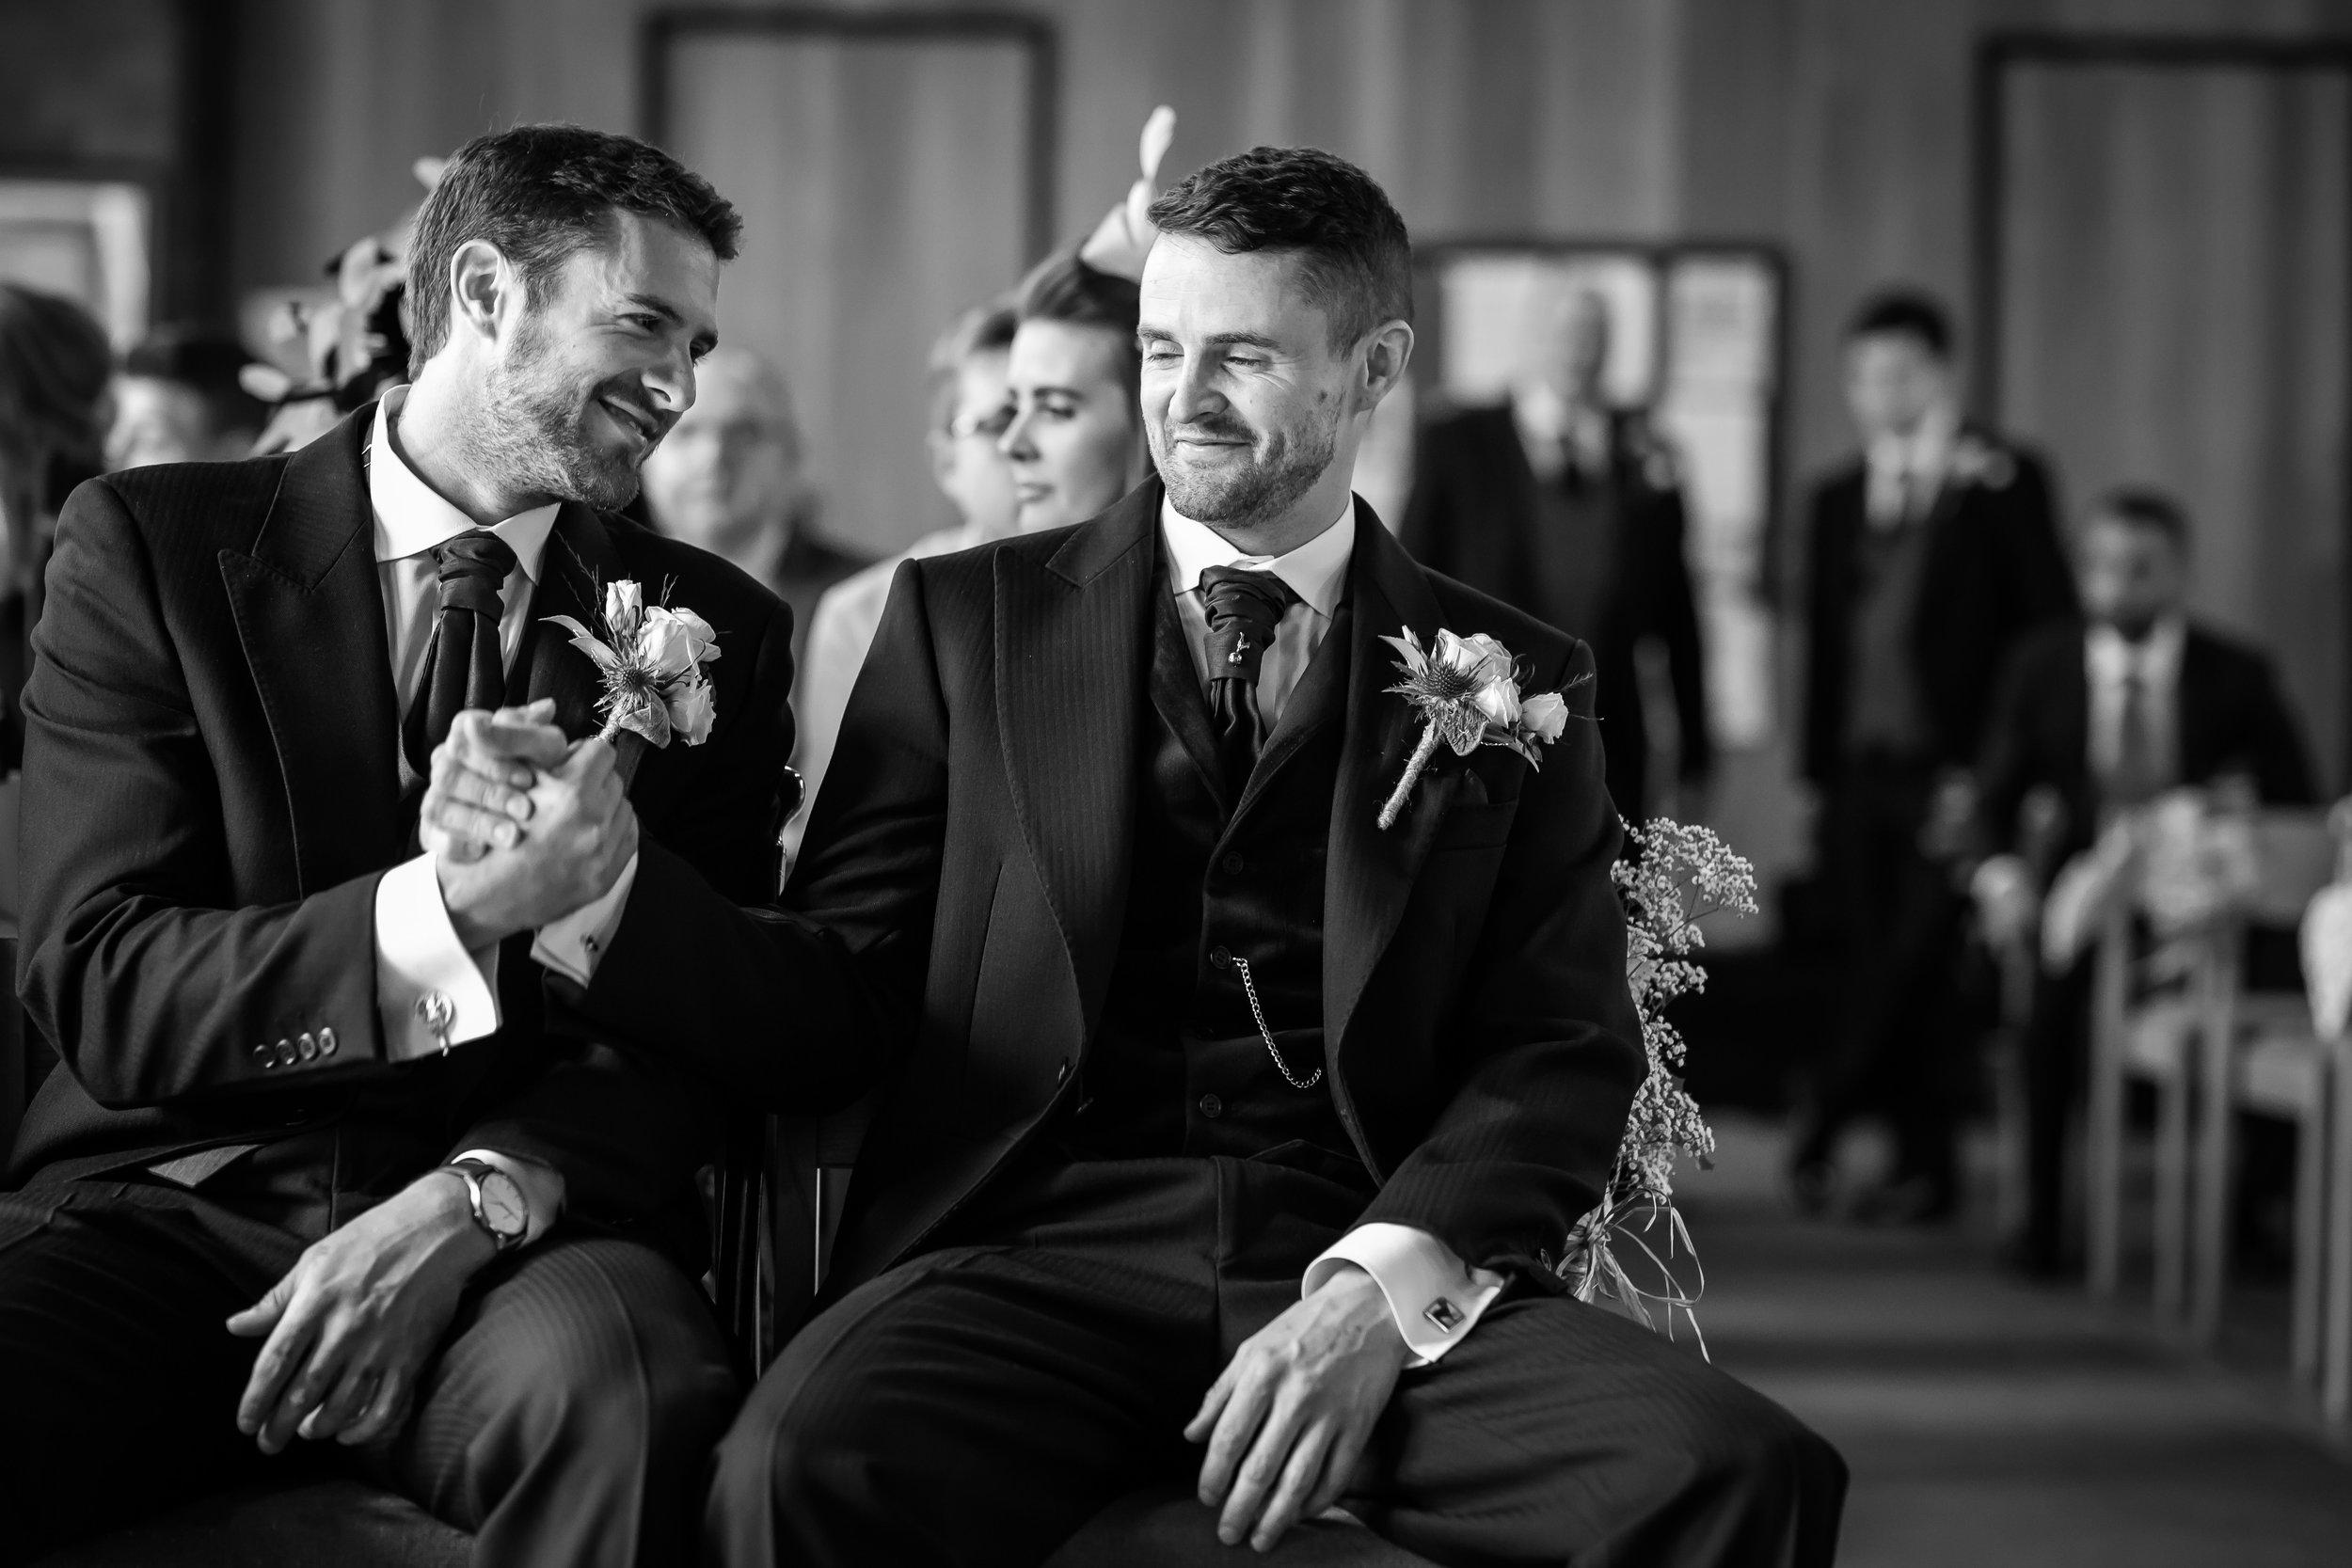 Oldham wedding photography best man